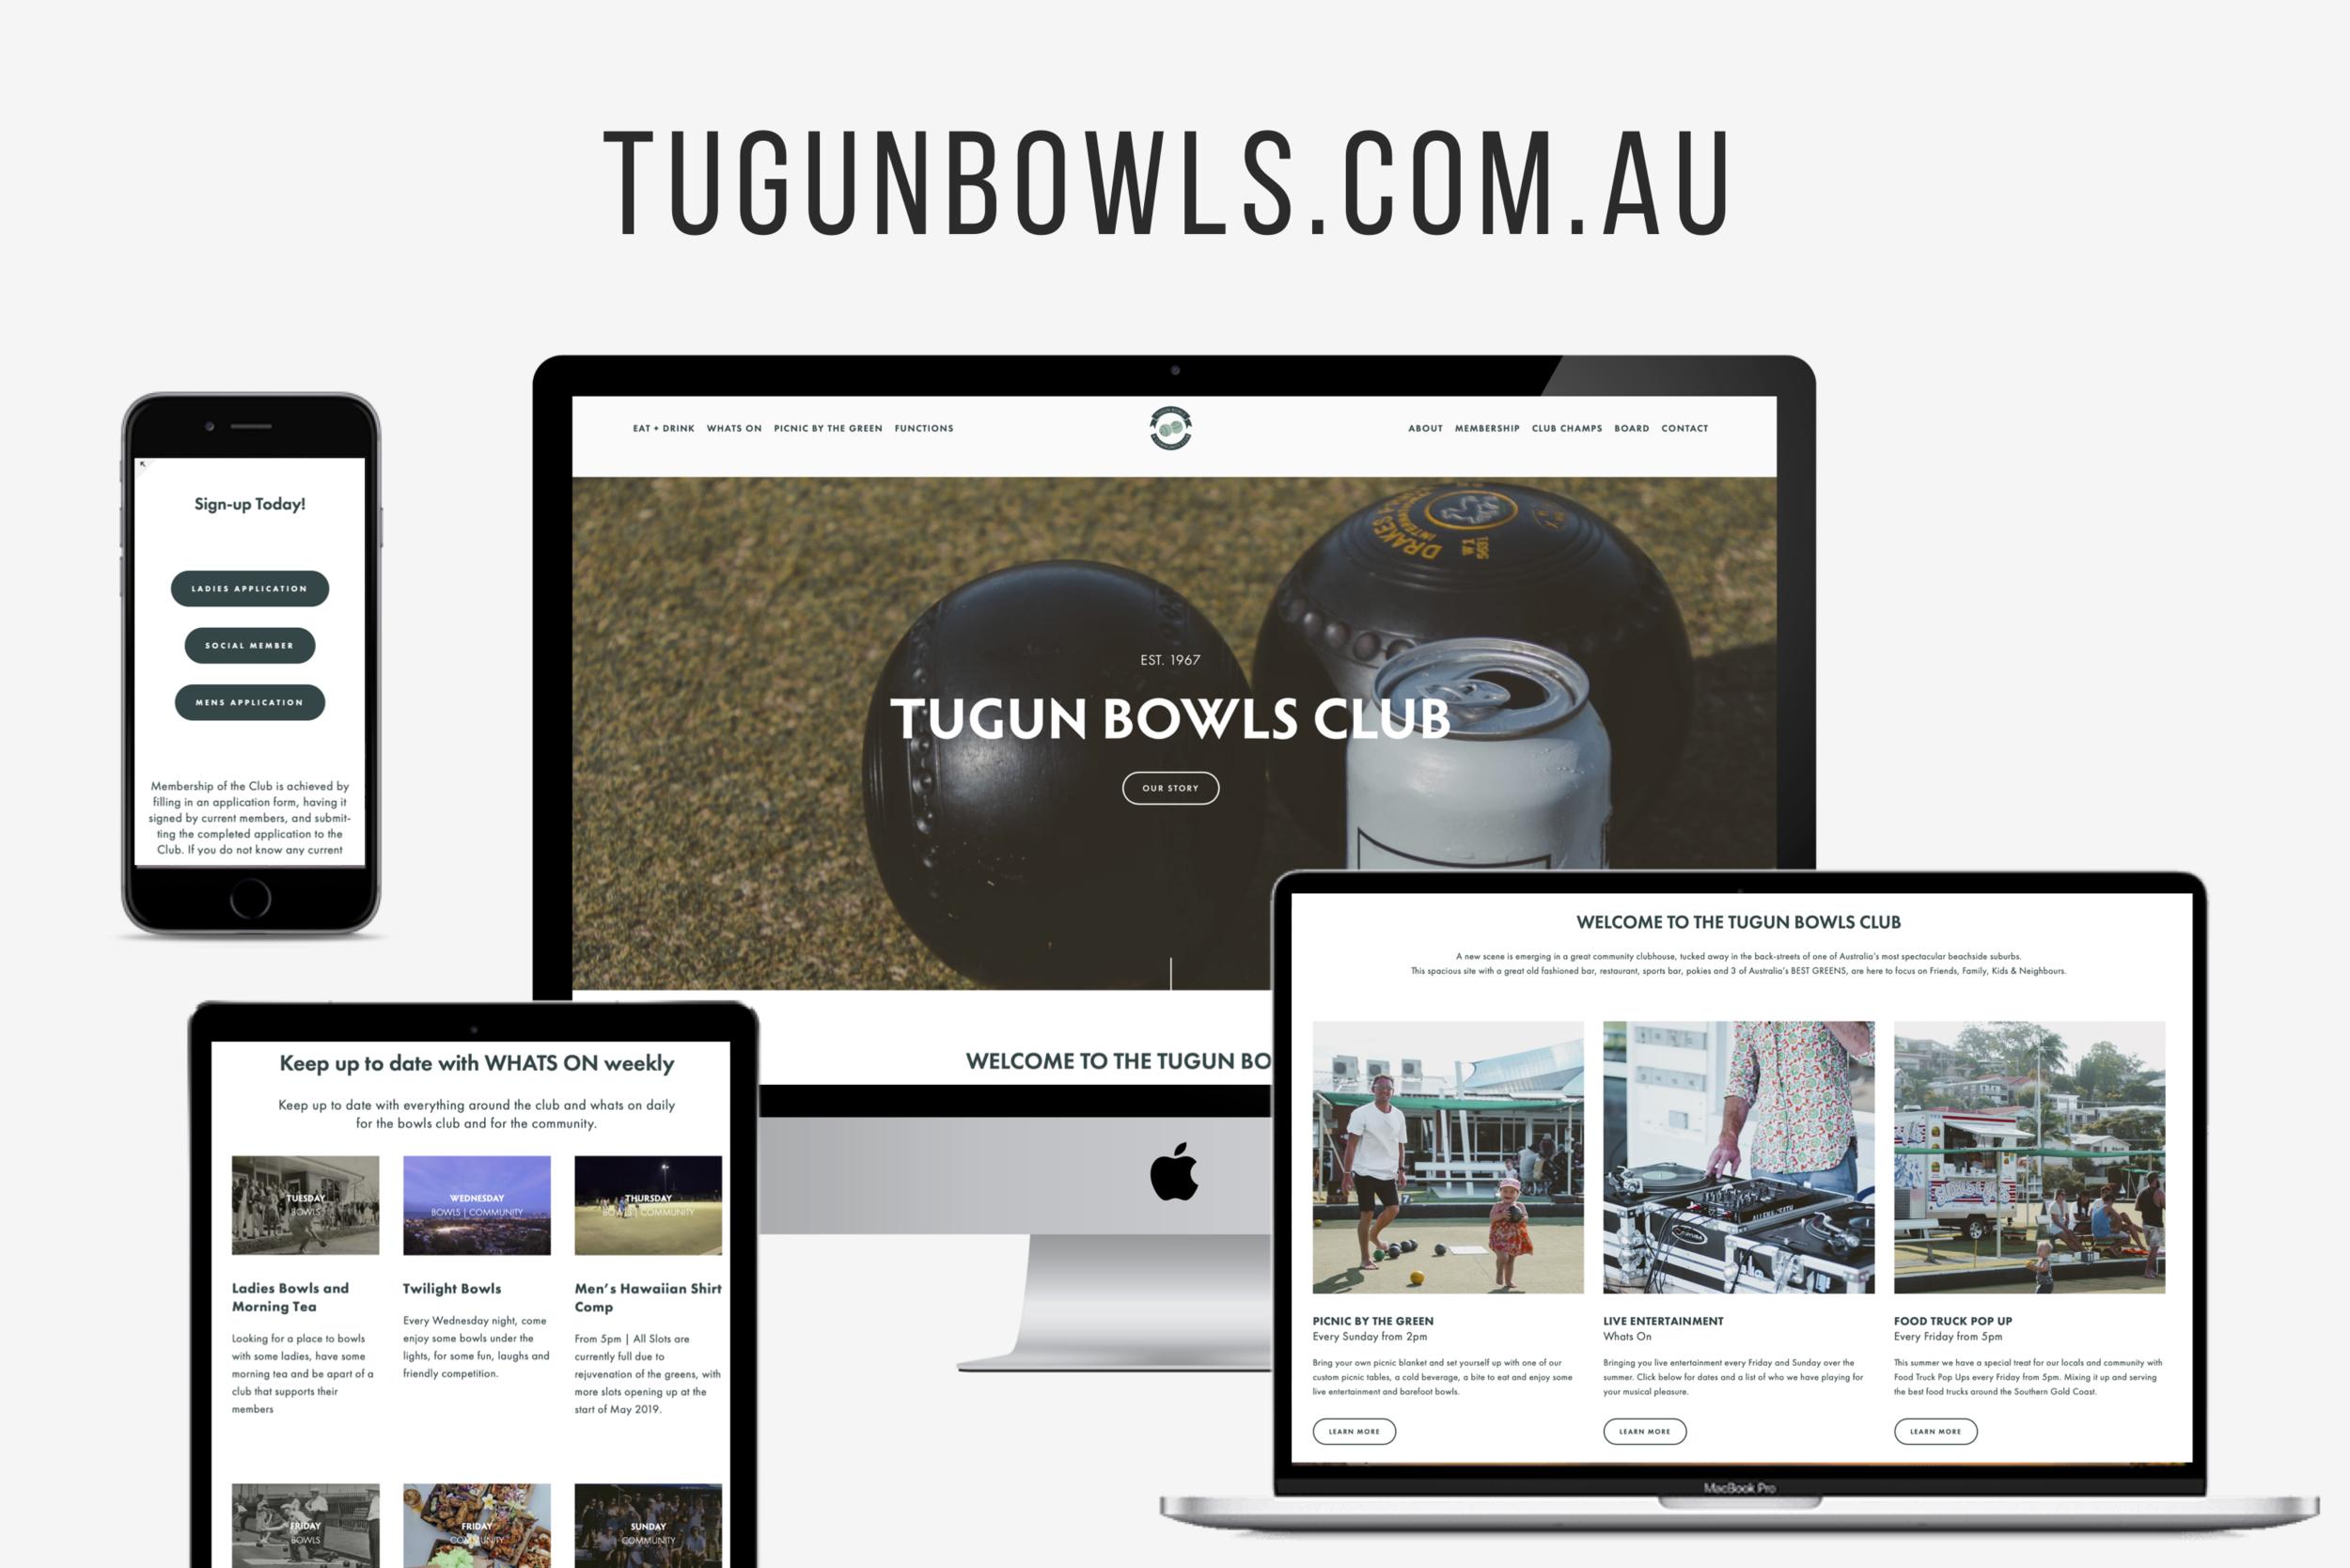 tugunbowls.com.au 2.png